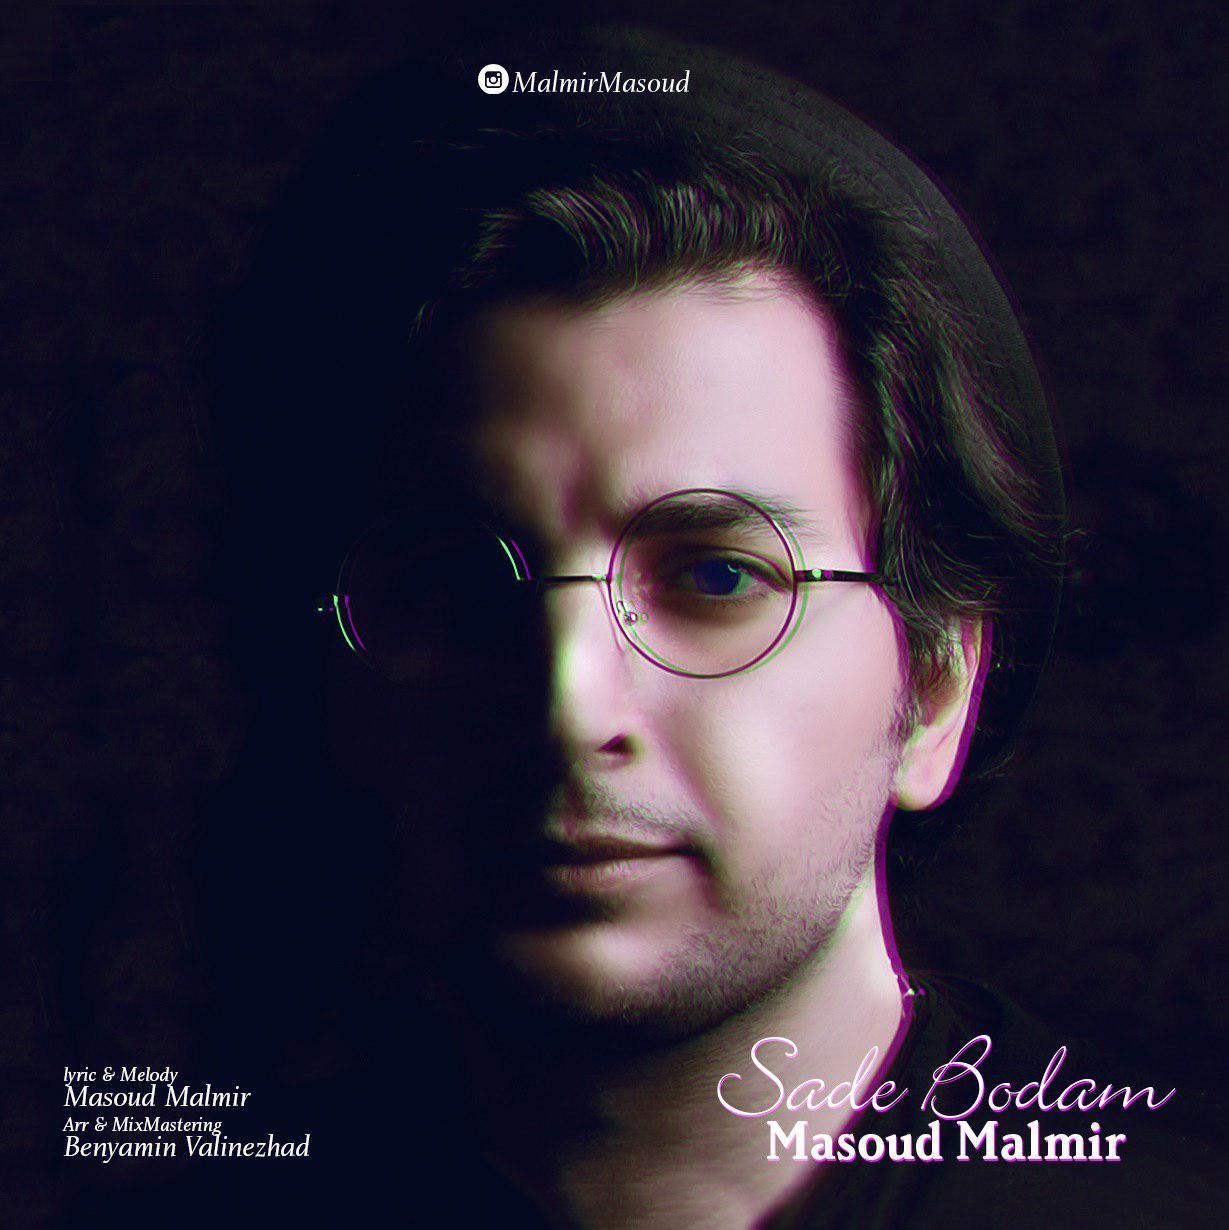 Masoud Malmir – Sade Bodam